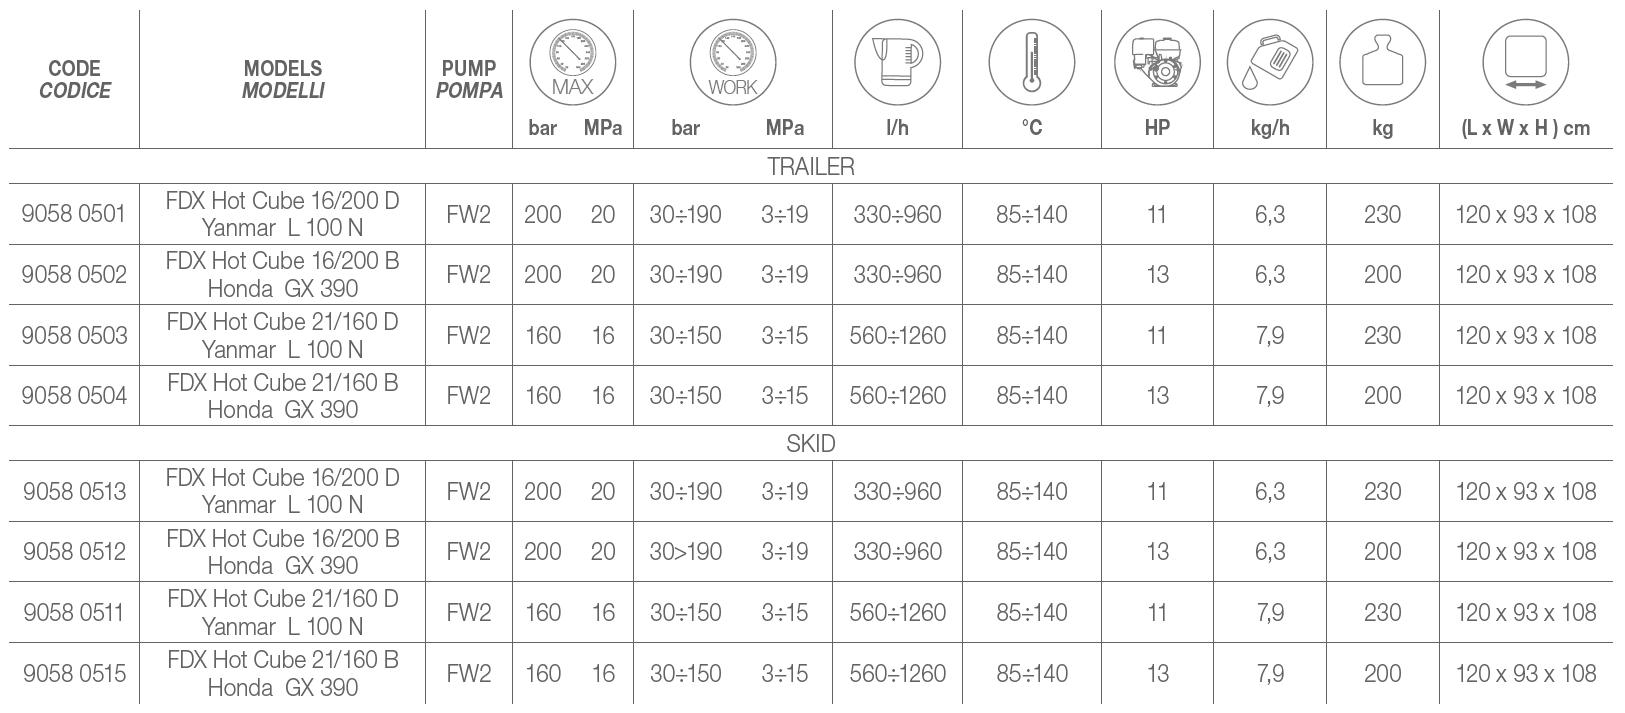 FDX HOT CUBE Technical Data